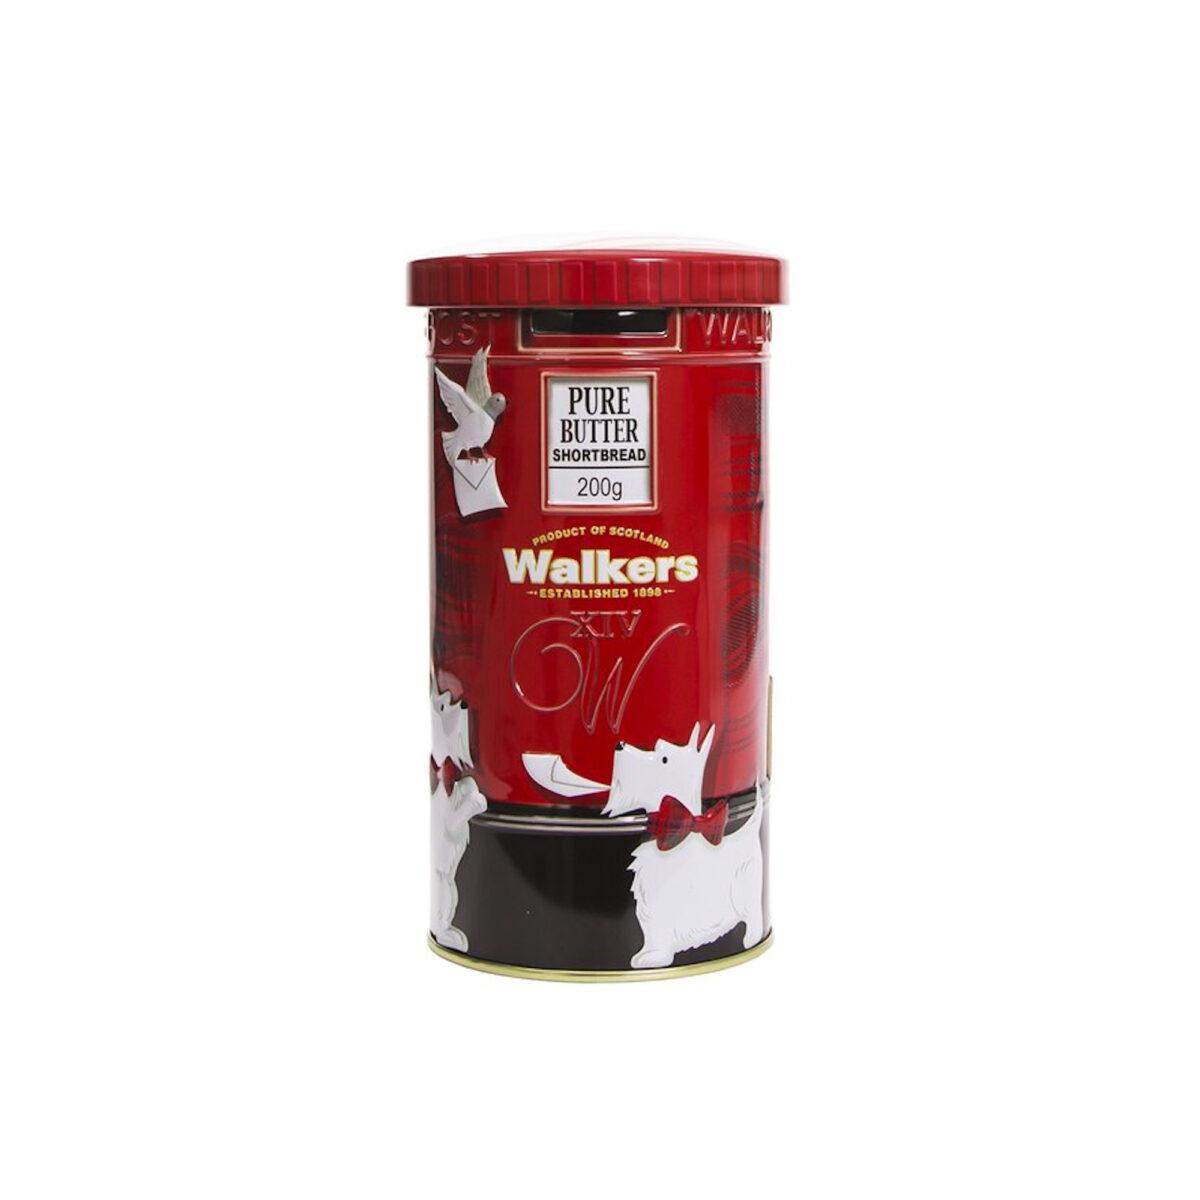 Walkers Shortbread Post Box Keepsake Tin